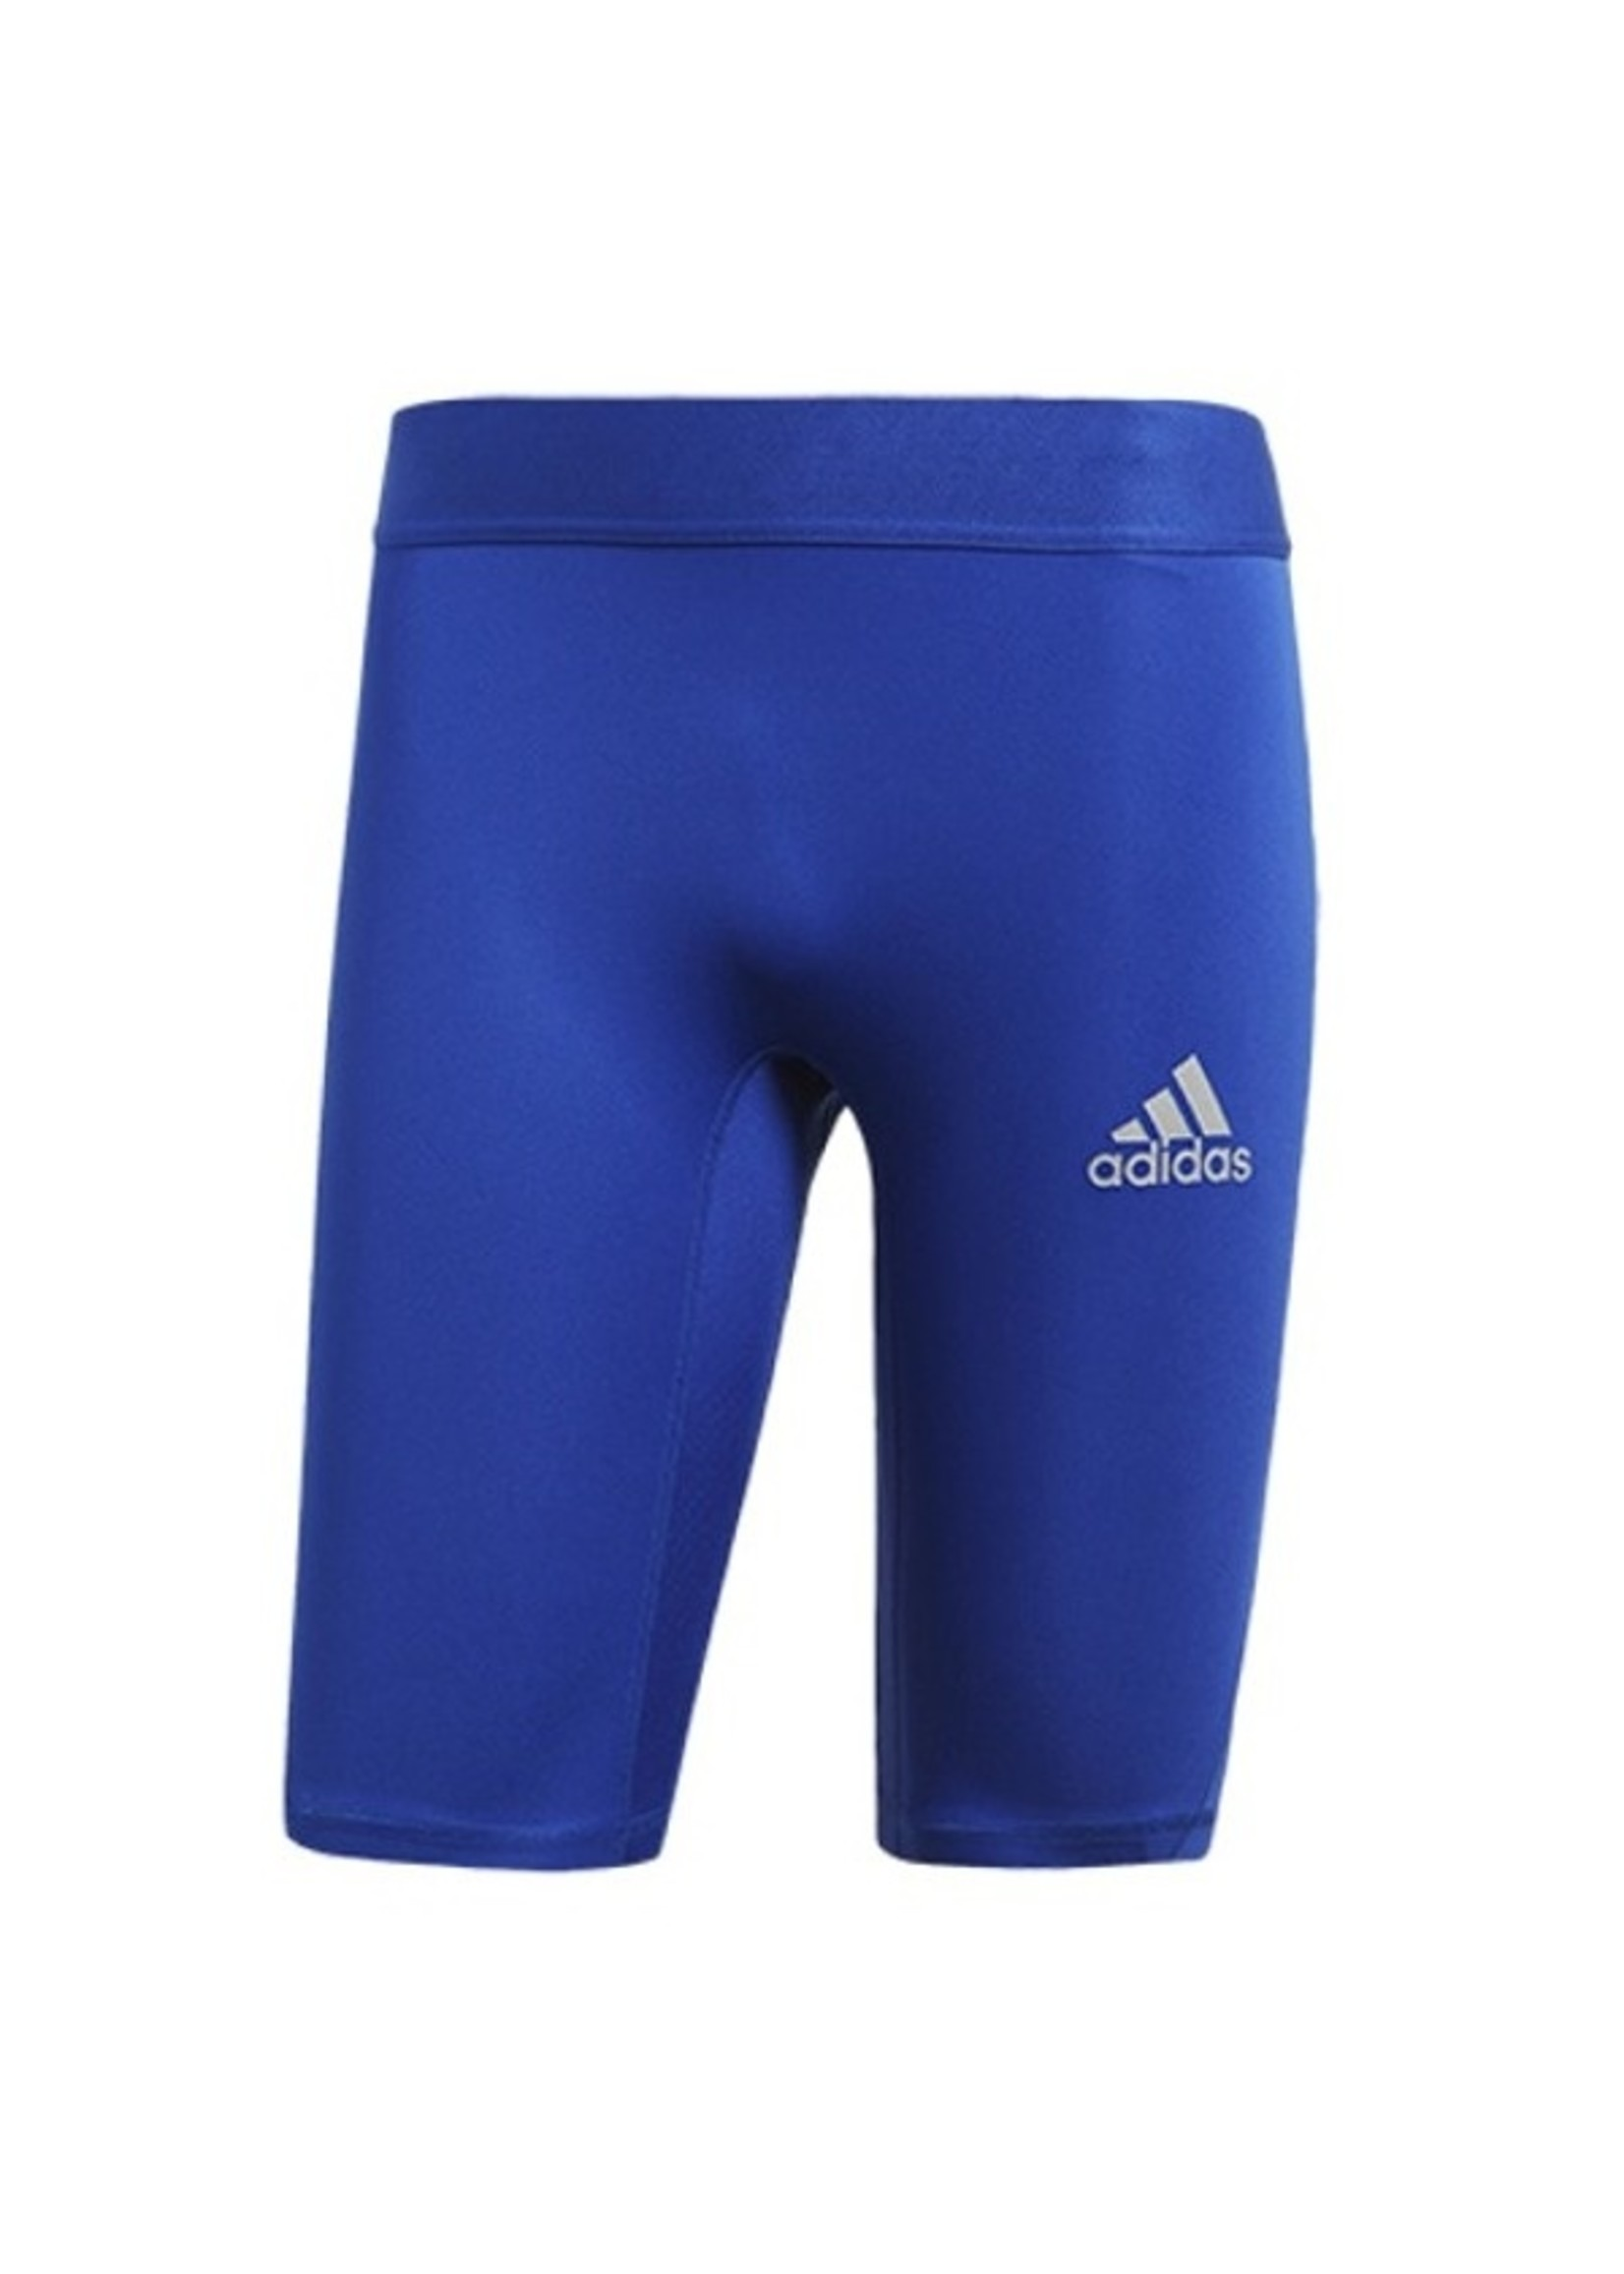 Adidas Compression Blue Short Youth